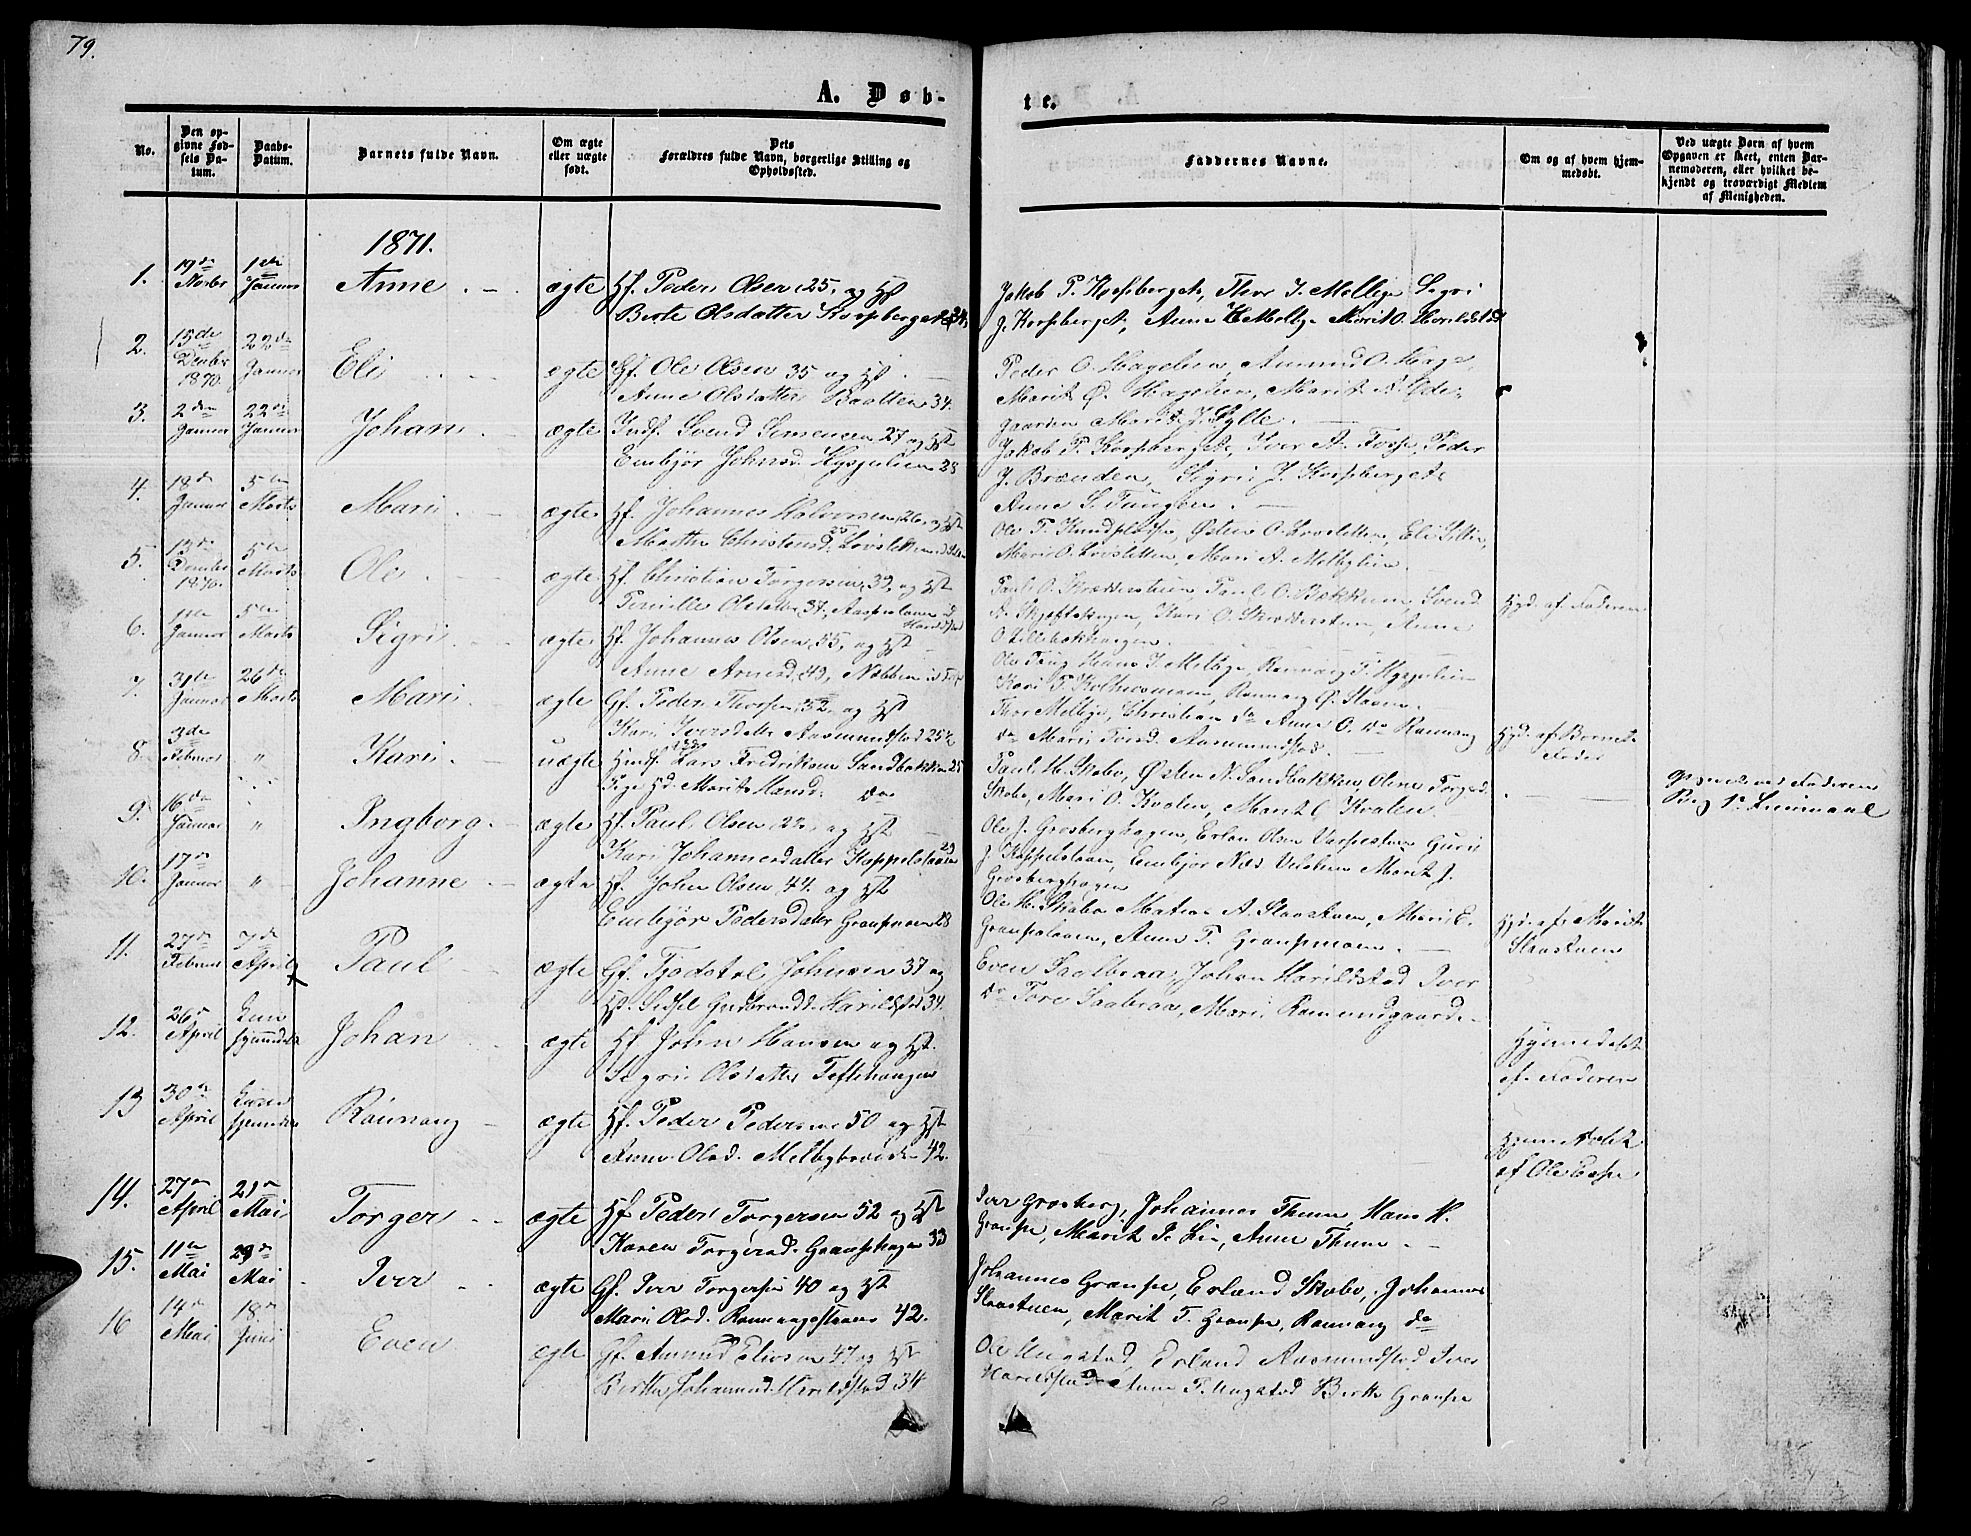 SAH, Nord-Fron prestekontor, Klokkerbok nr. 2, 1851-1883, s. 79